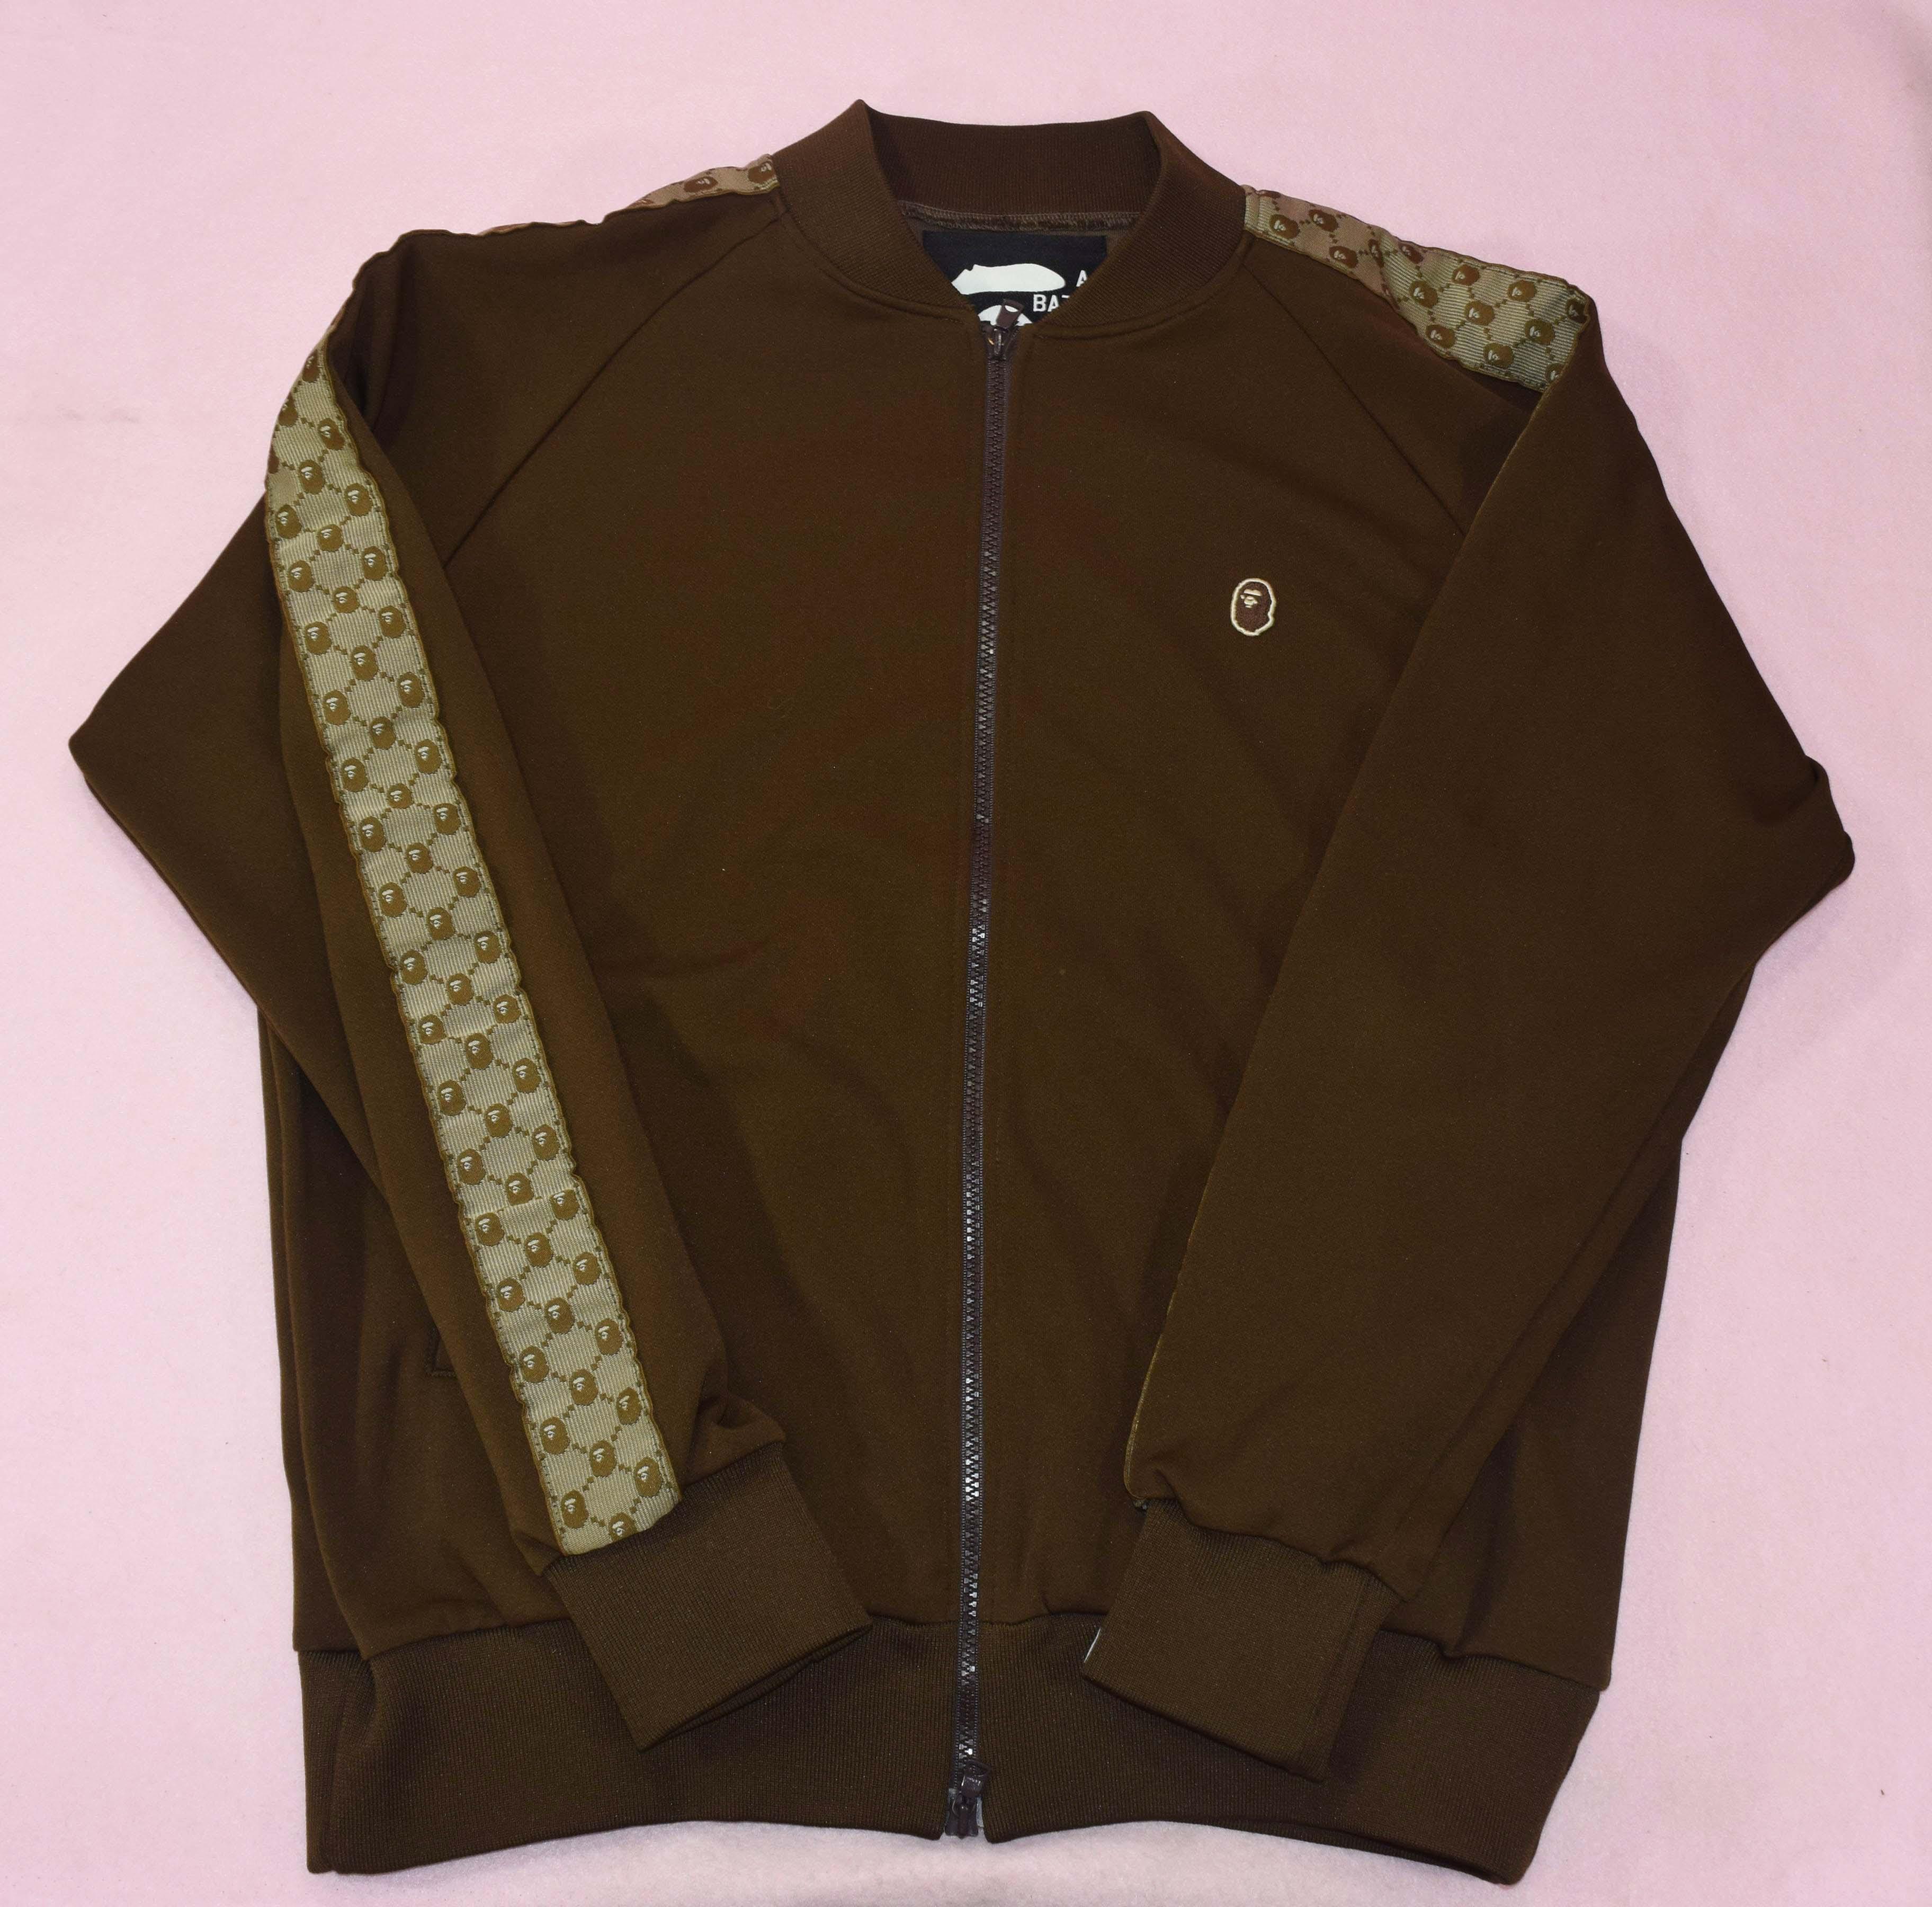 e74a92d85 Bape Og Bape 'gucci Inspired' Ape Head Monogram Track Jacket Brown Size M |  Grailed